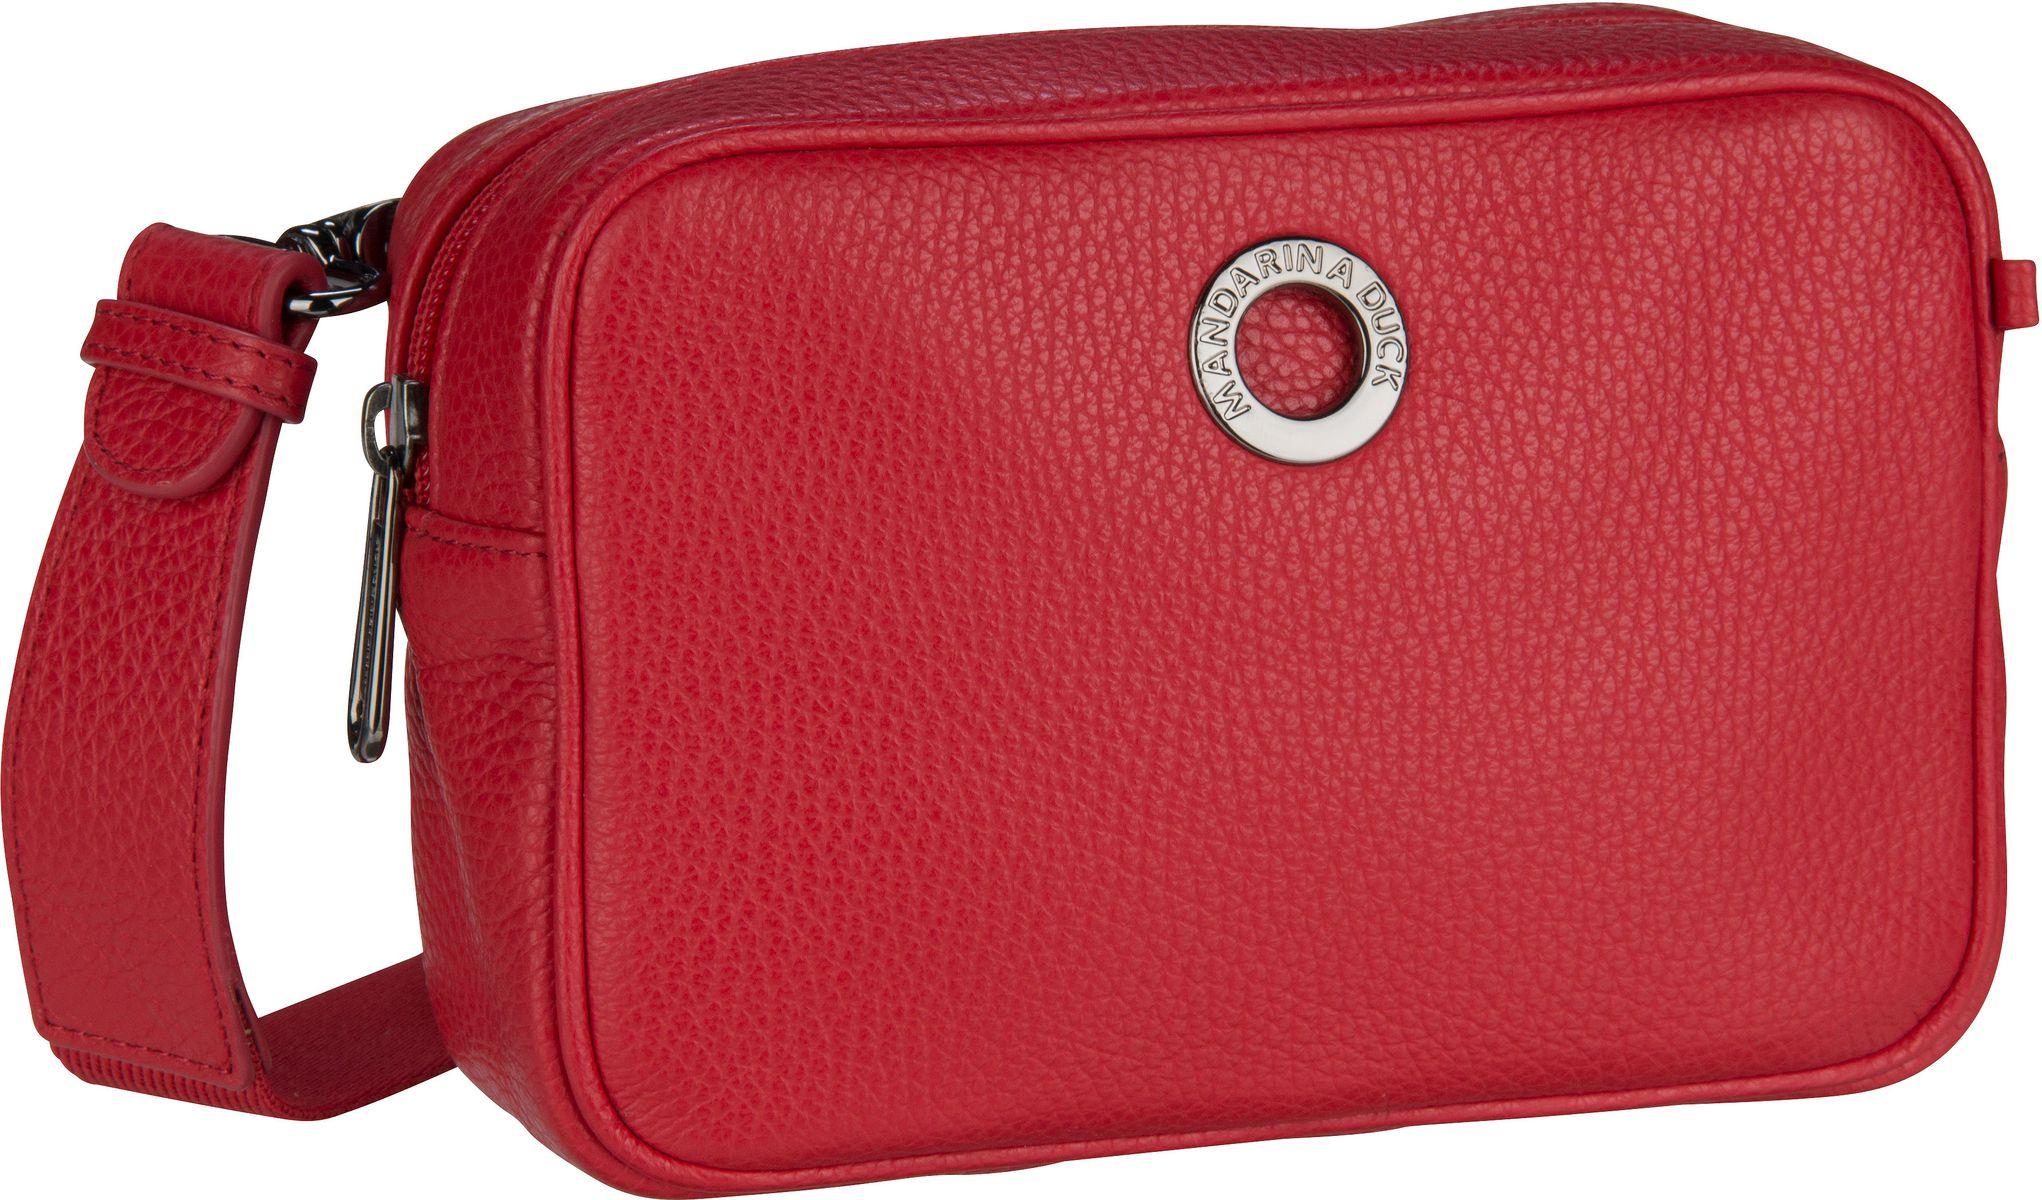 Umhängetasche Mellow Leather Camera Bag FZT22 Flame Scarlet